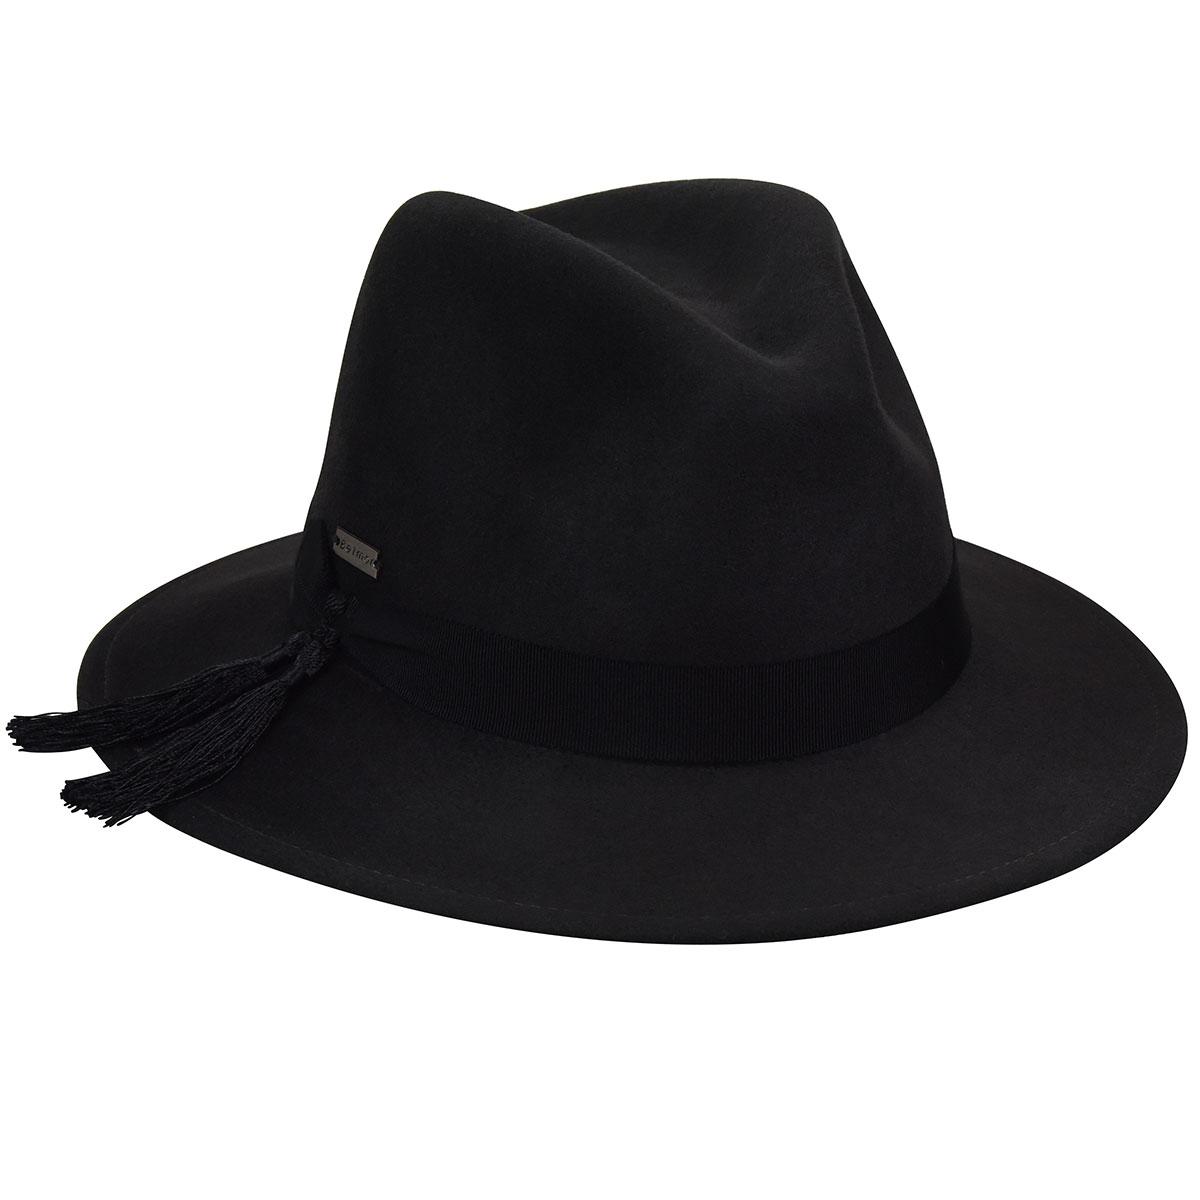 Women's Vintage Hats | Old Fashioned Hats | Retro Hats Ashland Fedora $105.00 AT vintagedancer.com